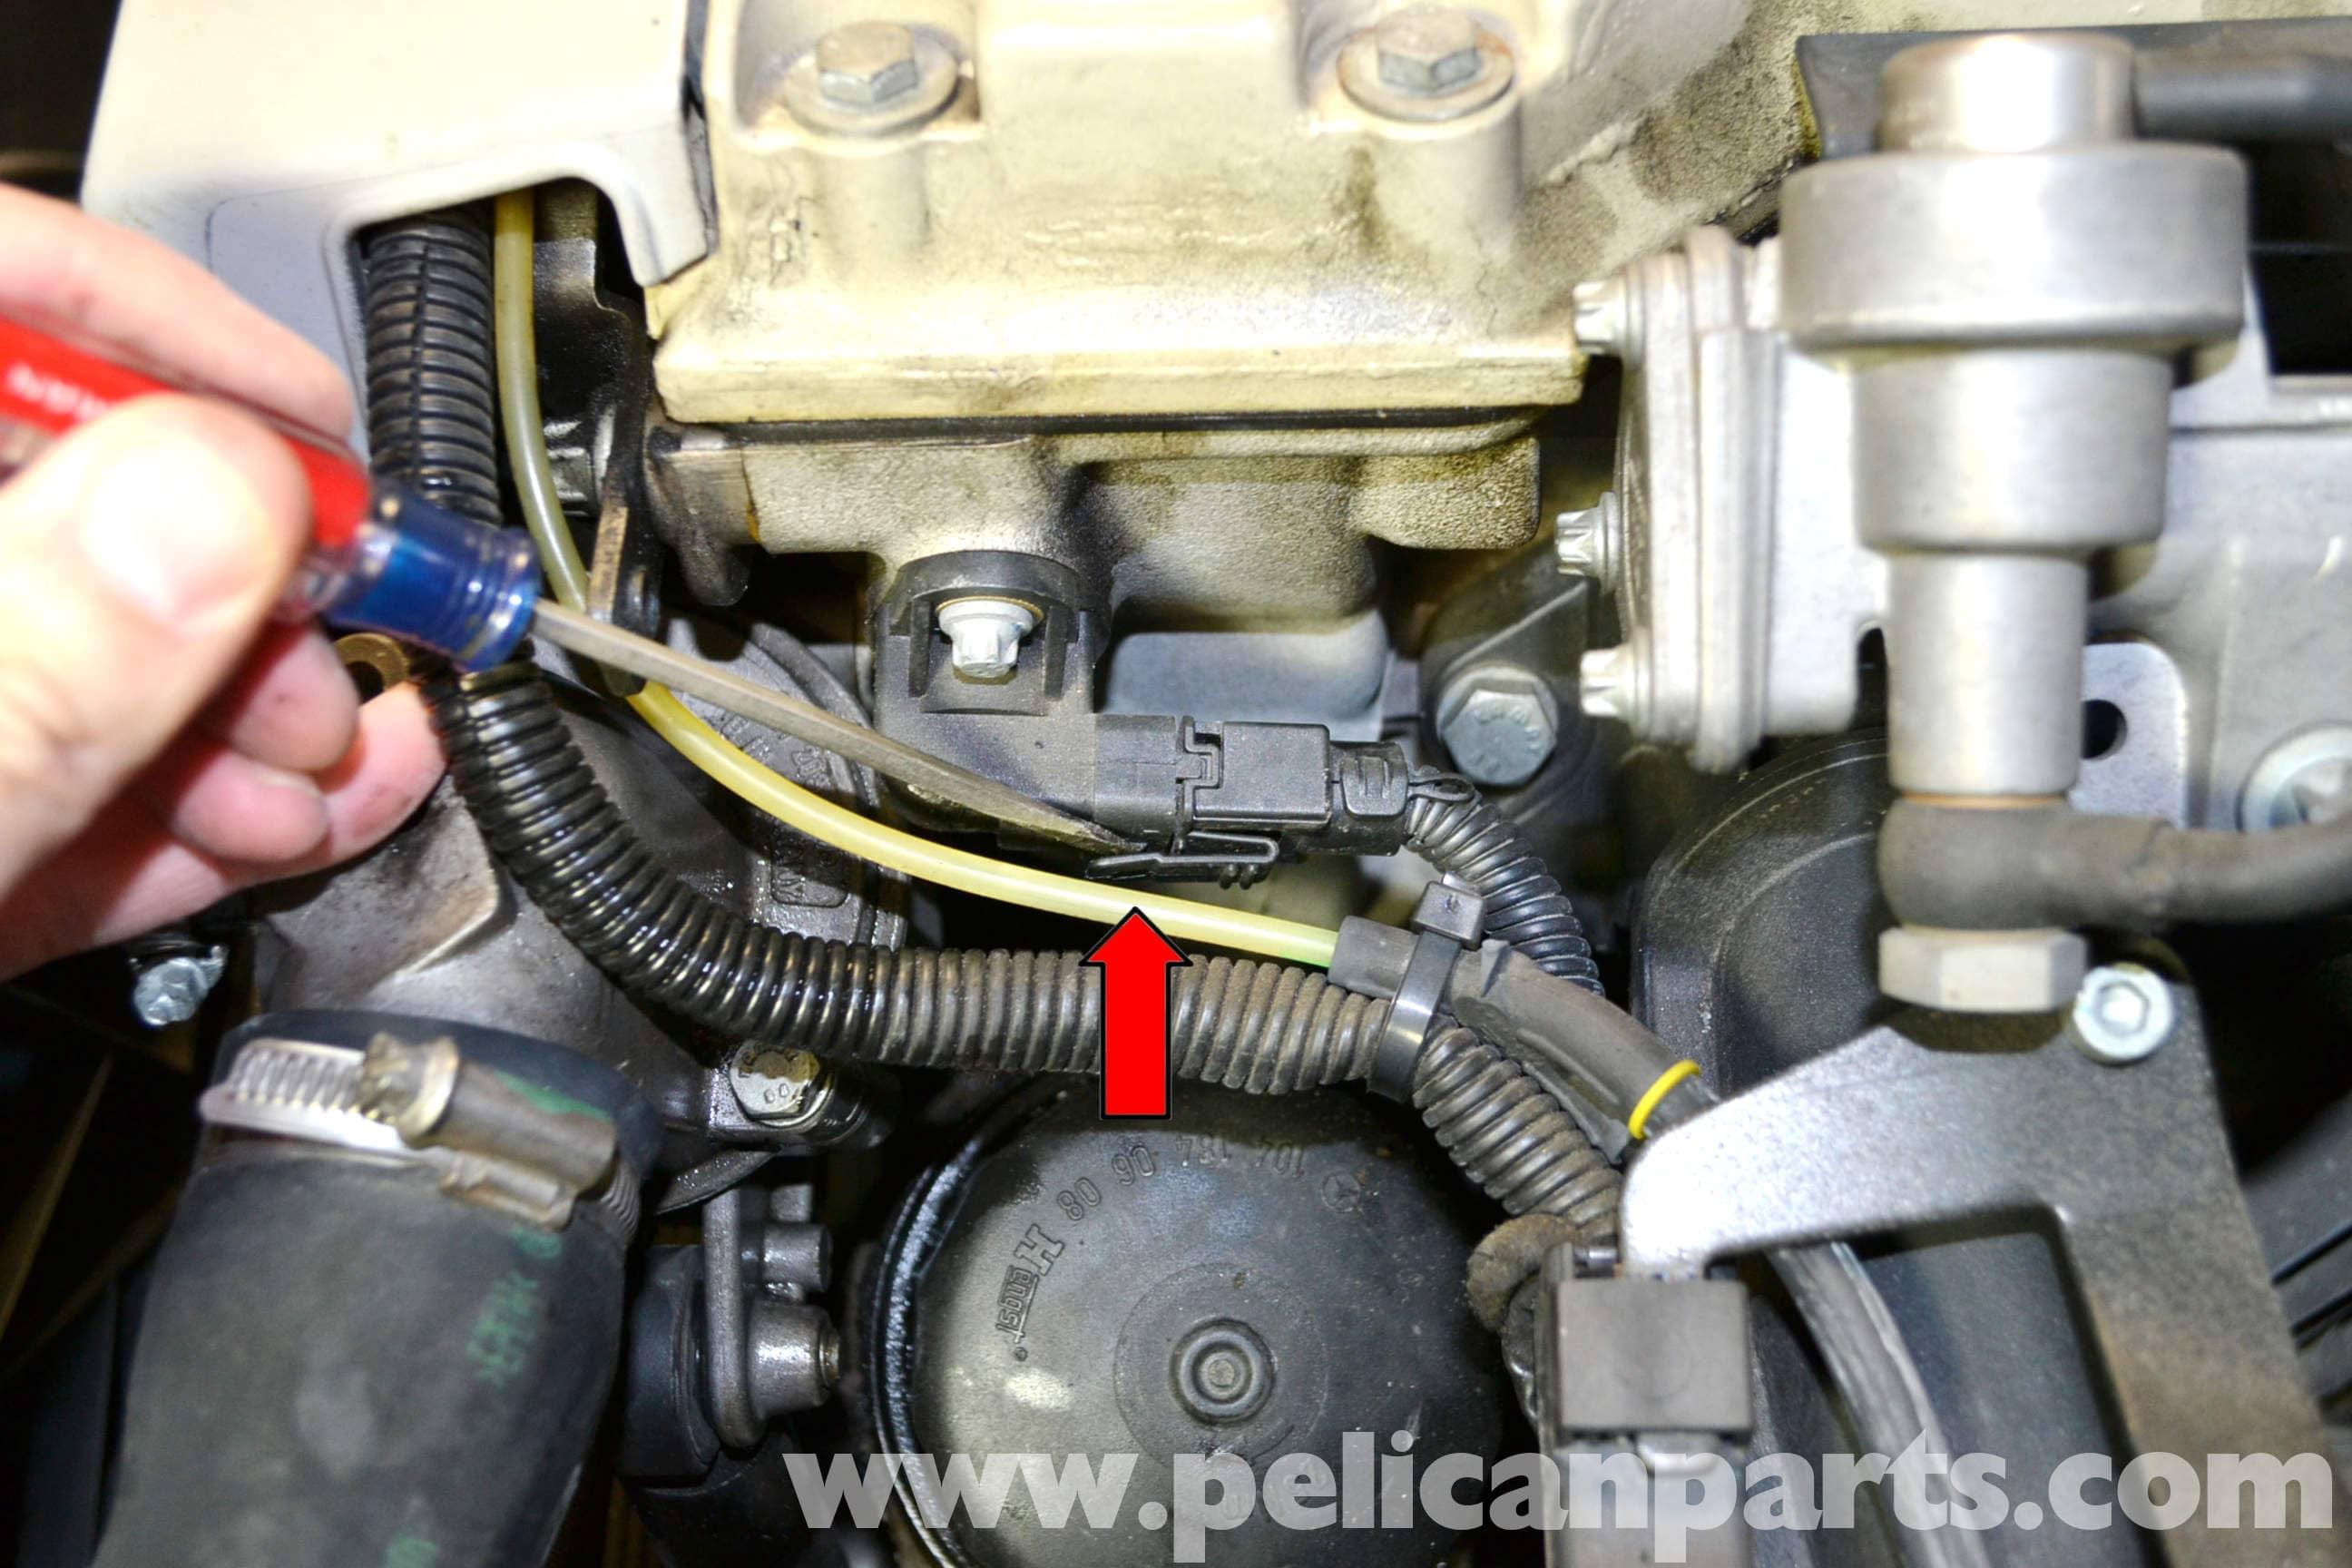 1999 Mercedes Slk 230 Wiring Diagram Benz Diagrams Camshaft Positioning Sensor Replacement